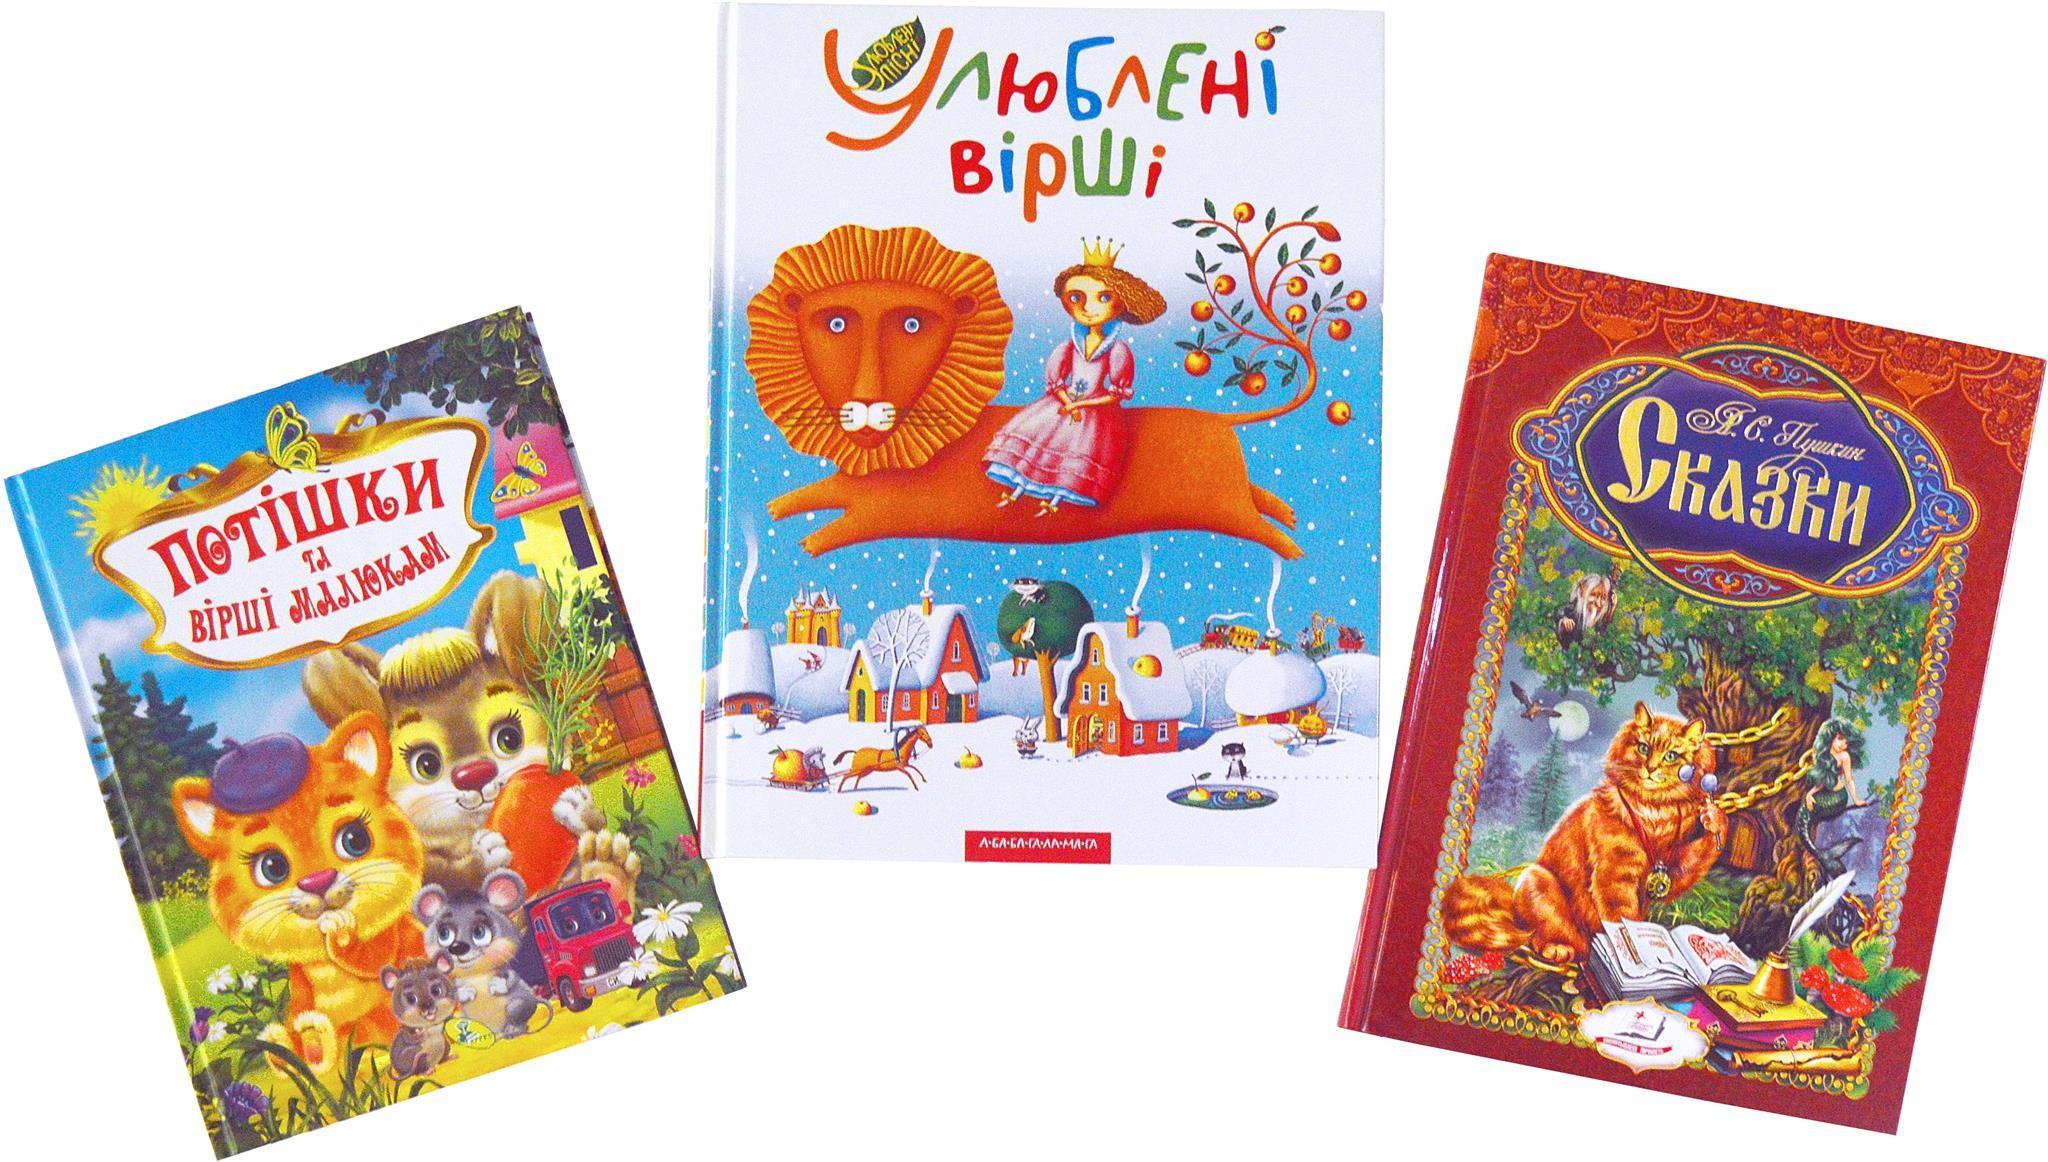 Детские книги : Книга сказка и книжка-розкладушка